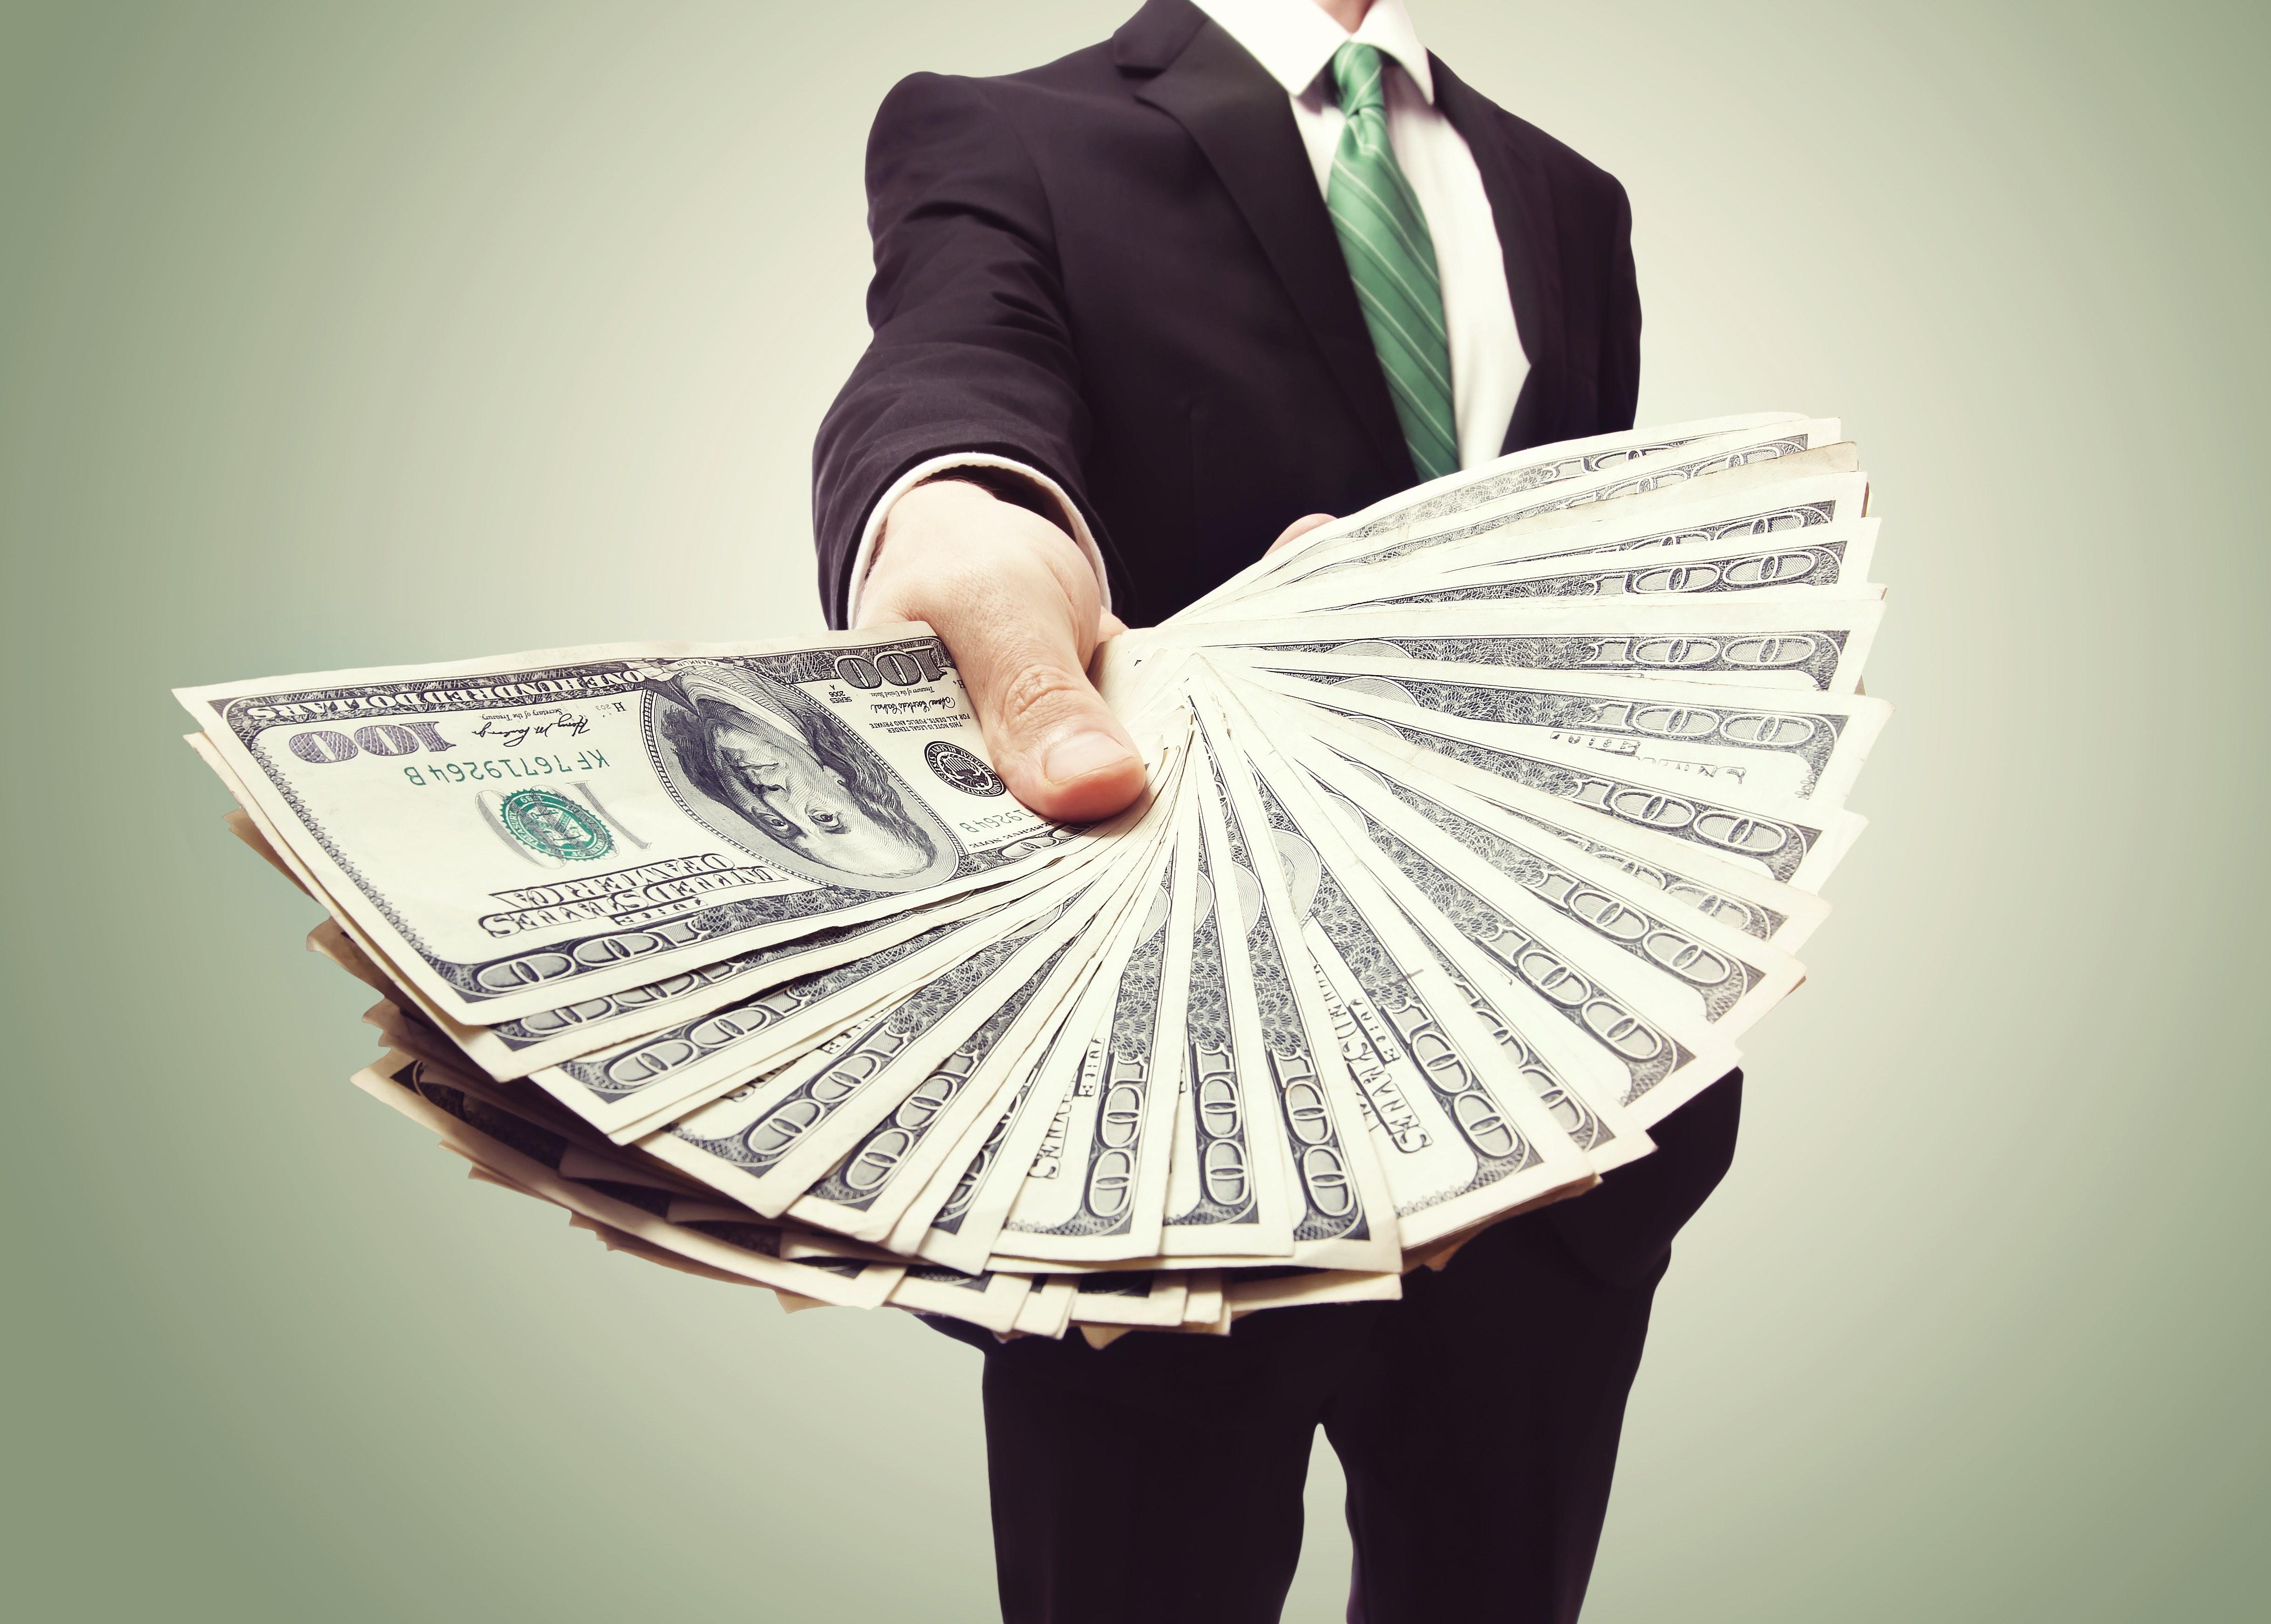 A businessperson holding a fan of money.